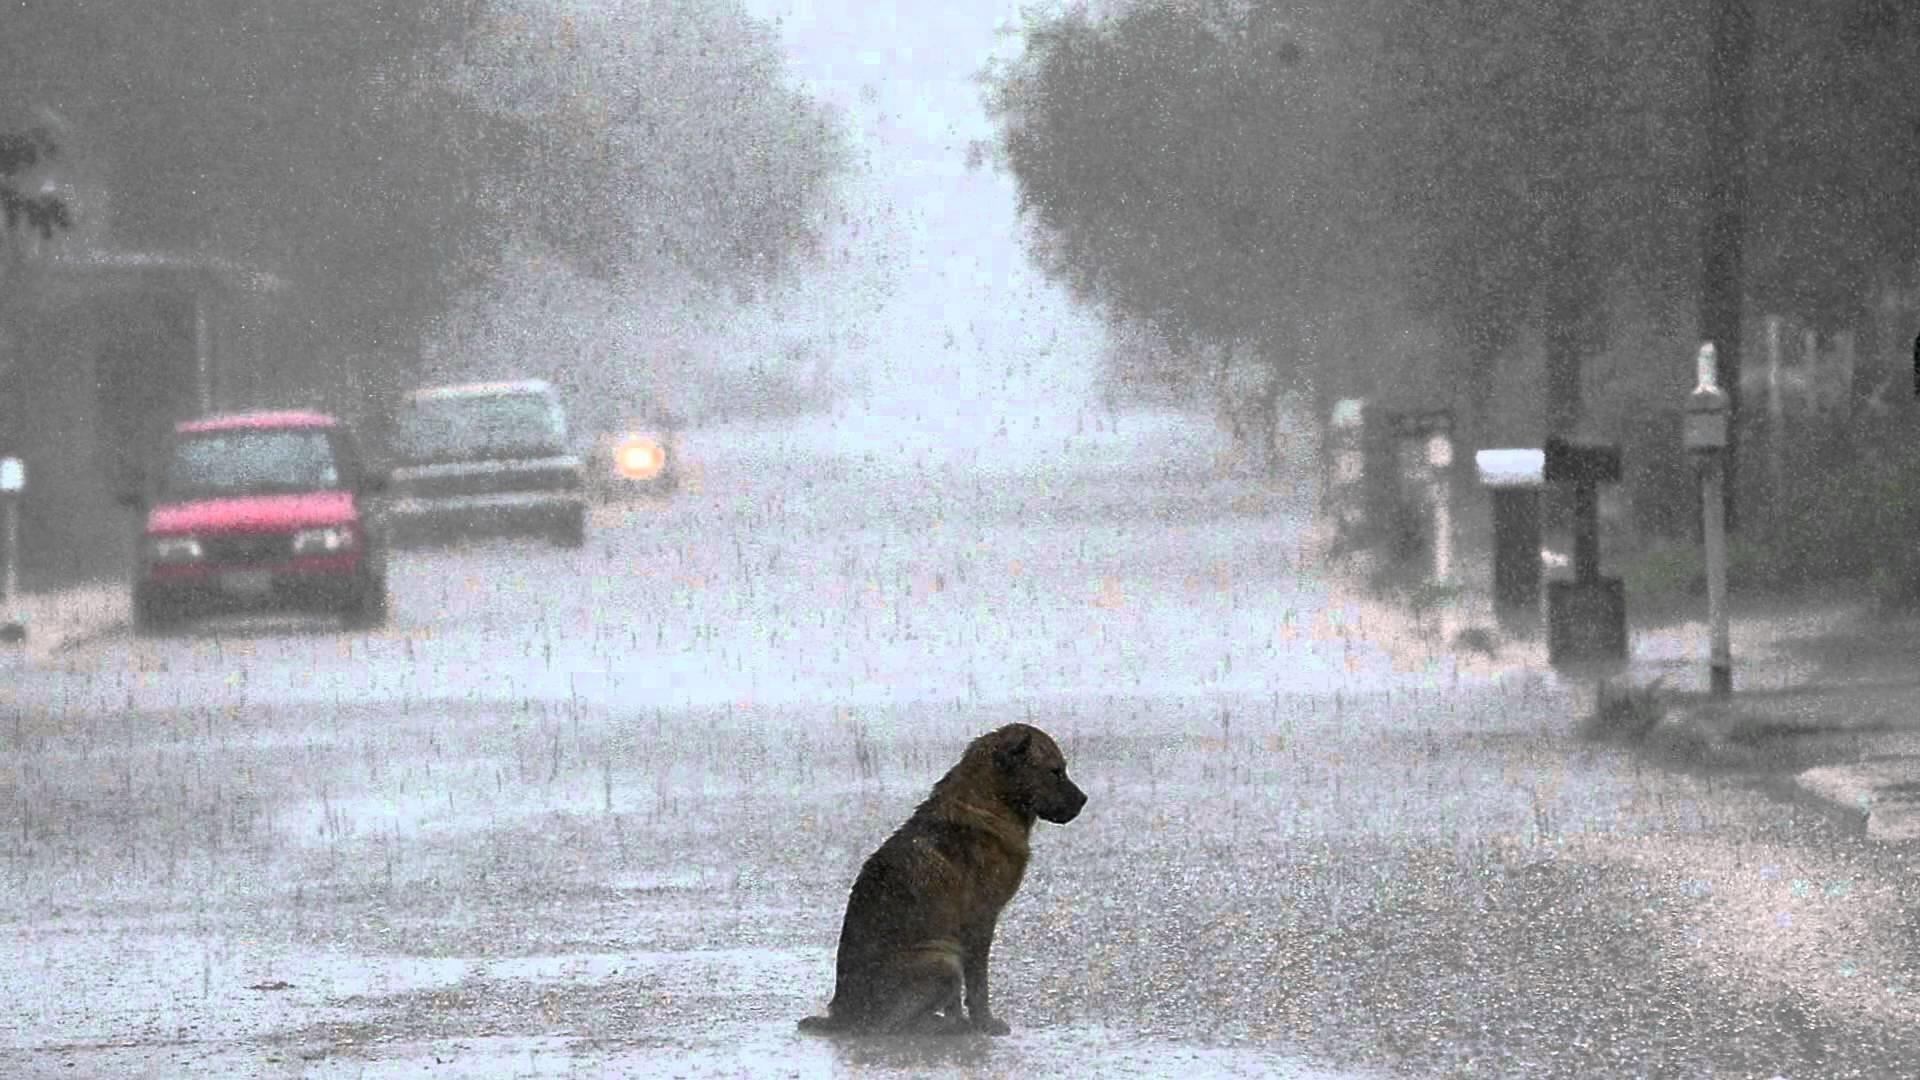 Very Sad Alone Girl Hd Wallpaper Seattle Rain Wallpaper 72 Images